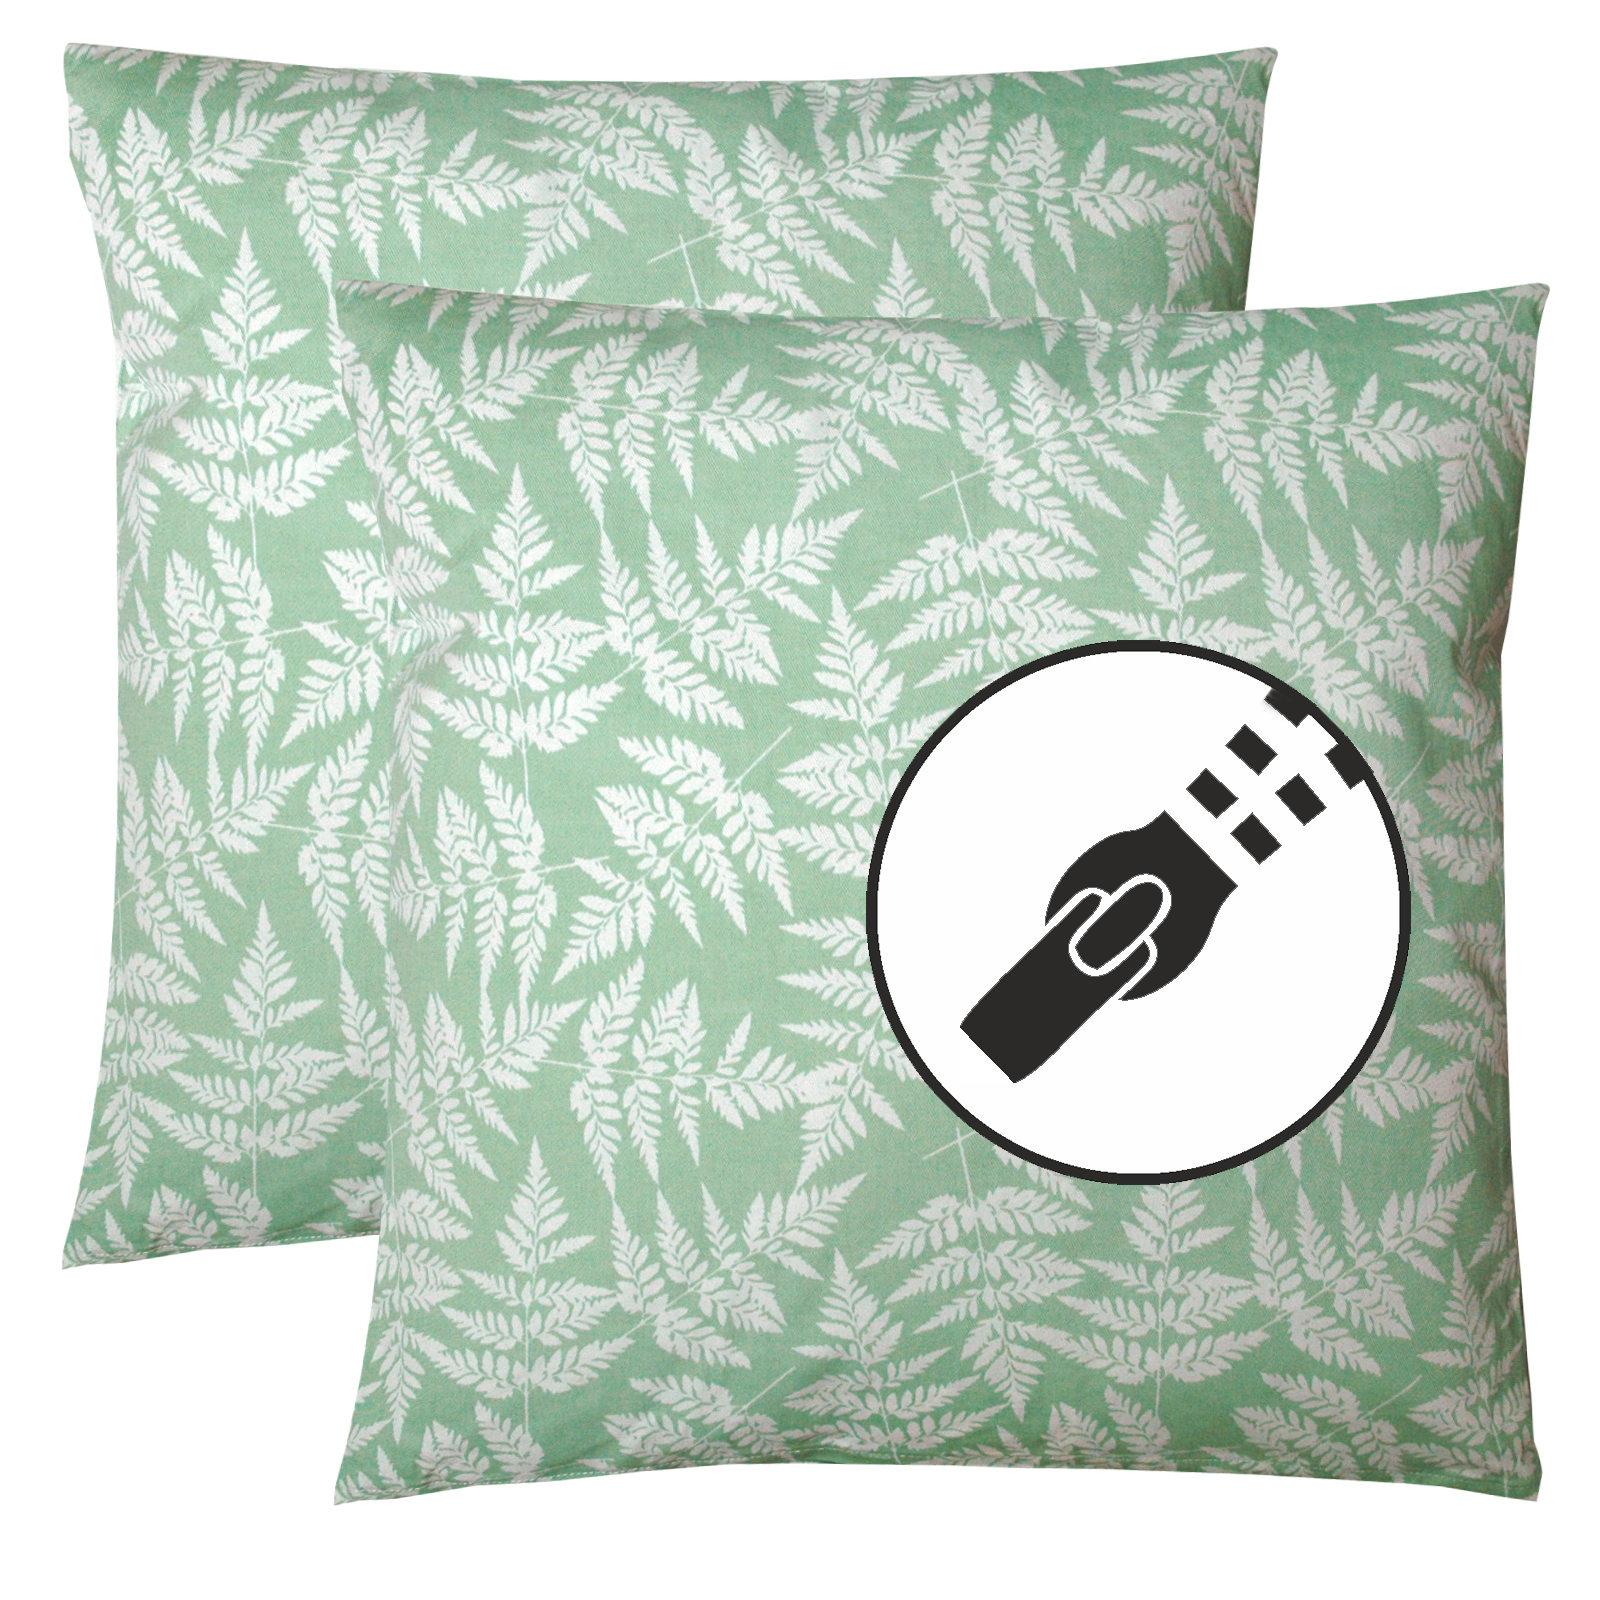 dekokissen set sofakissen 45x45 kissen f r couch dekokissen f r sofa 2er set ebay. Black Bedroom Furniture Sets. Home Design Ideas